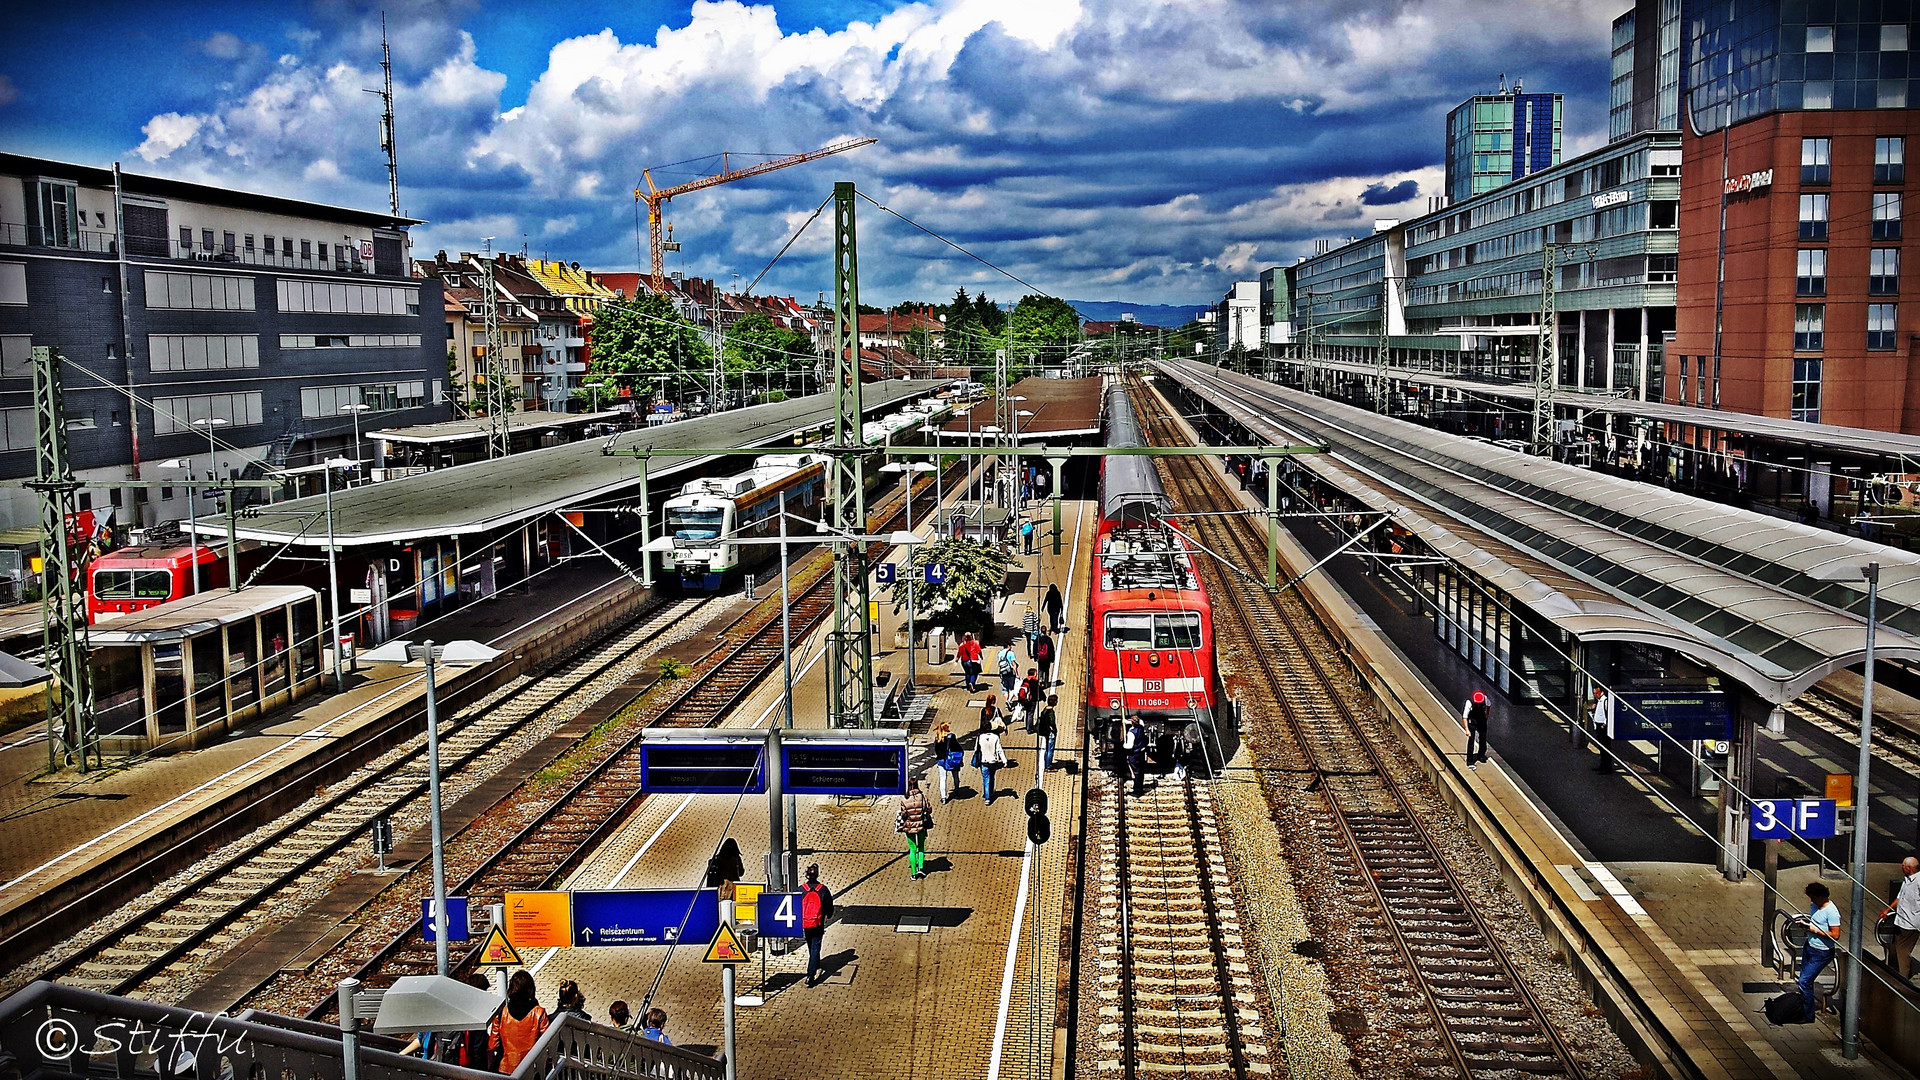 Bahnhof Freiburg im Breisgau